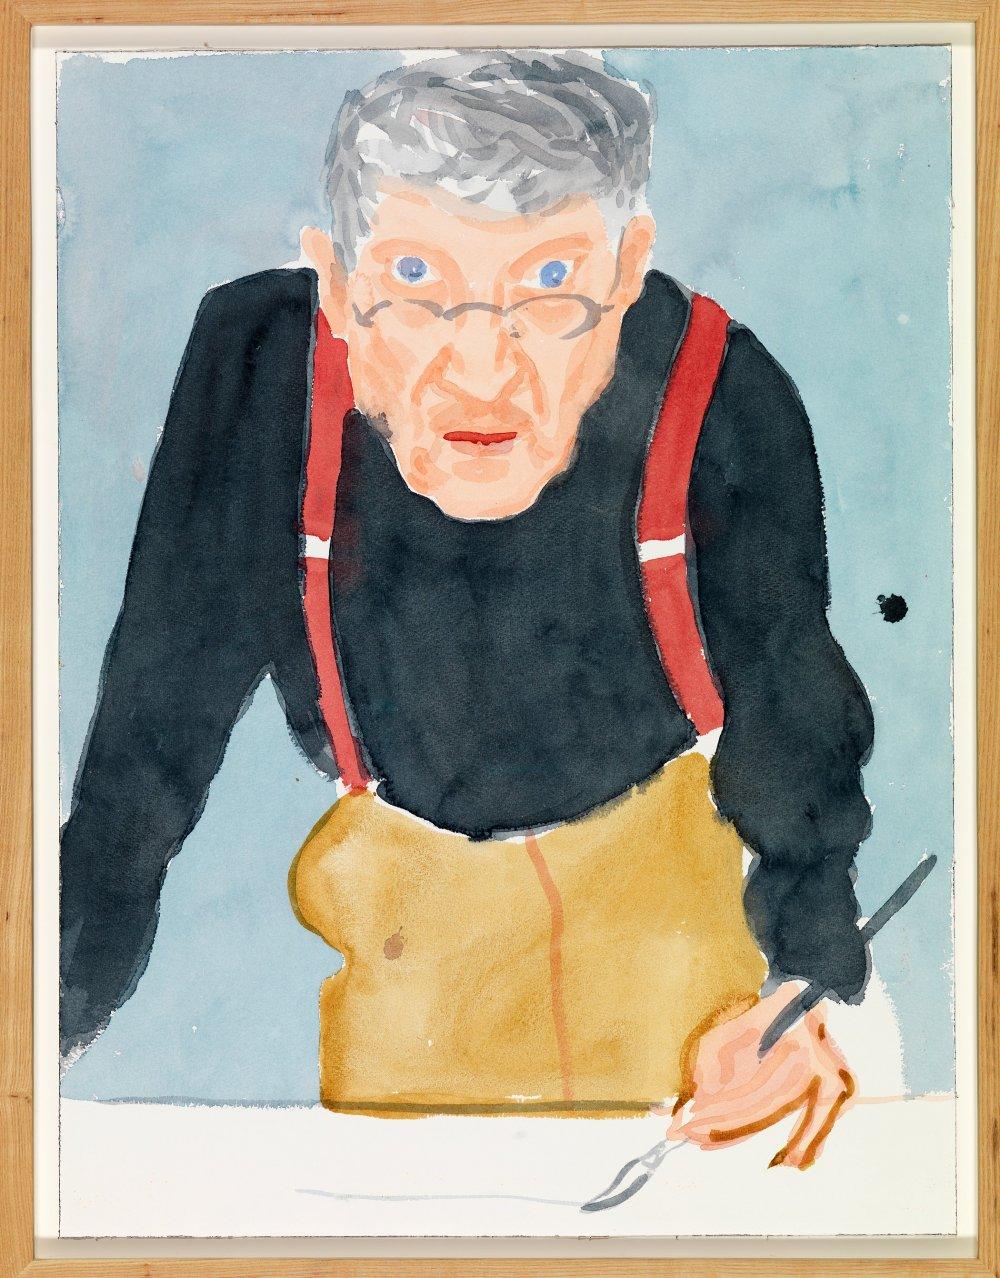 A recent self-portrait of David Hockney.